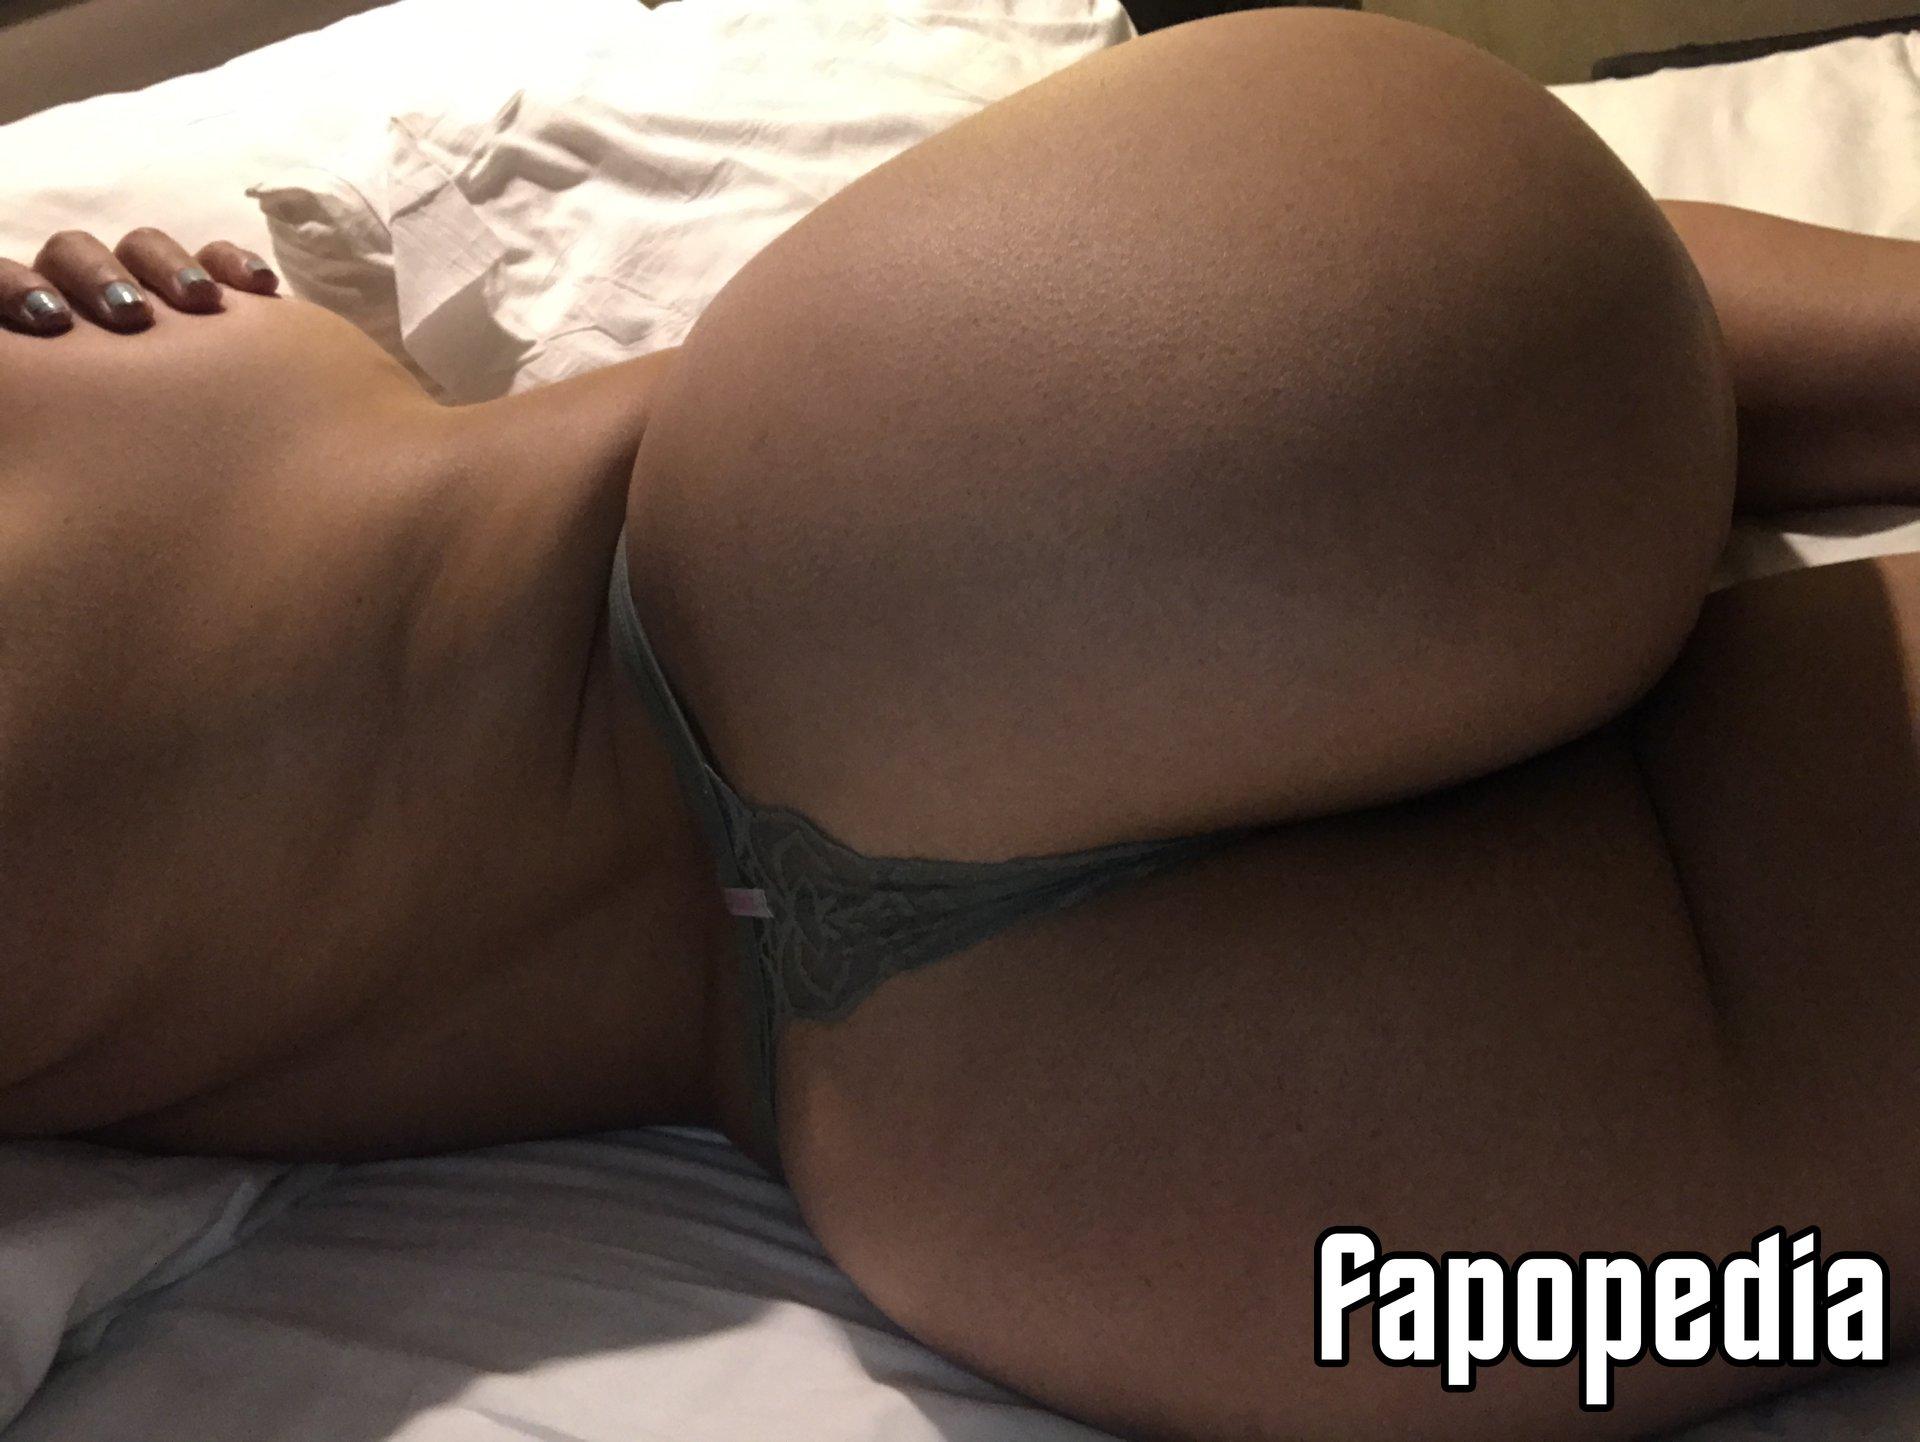 Msdesirae_xo Nude OnlyFans Leaks